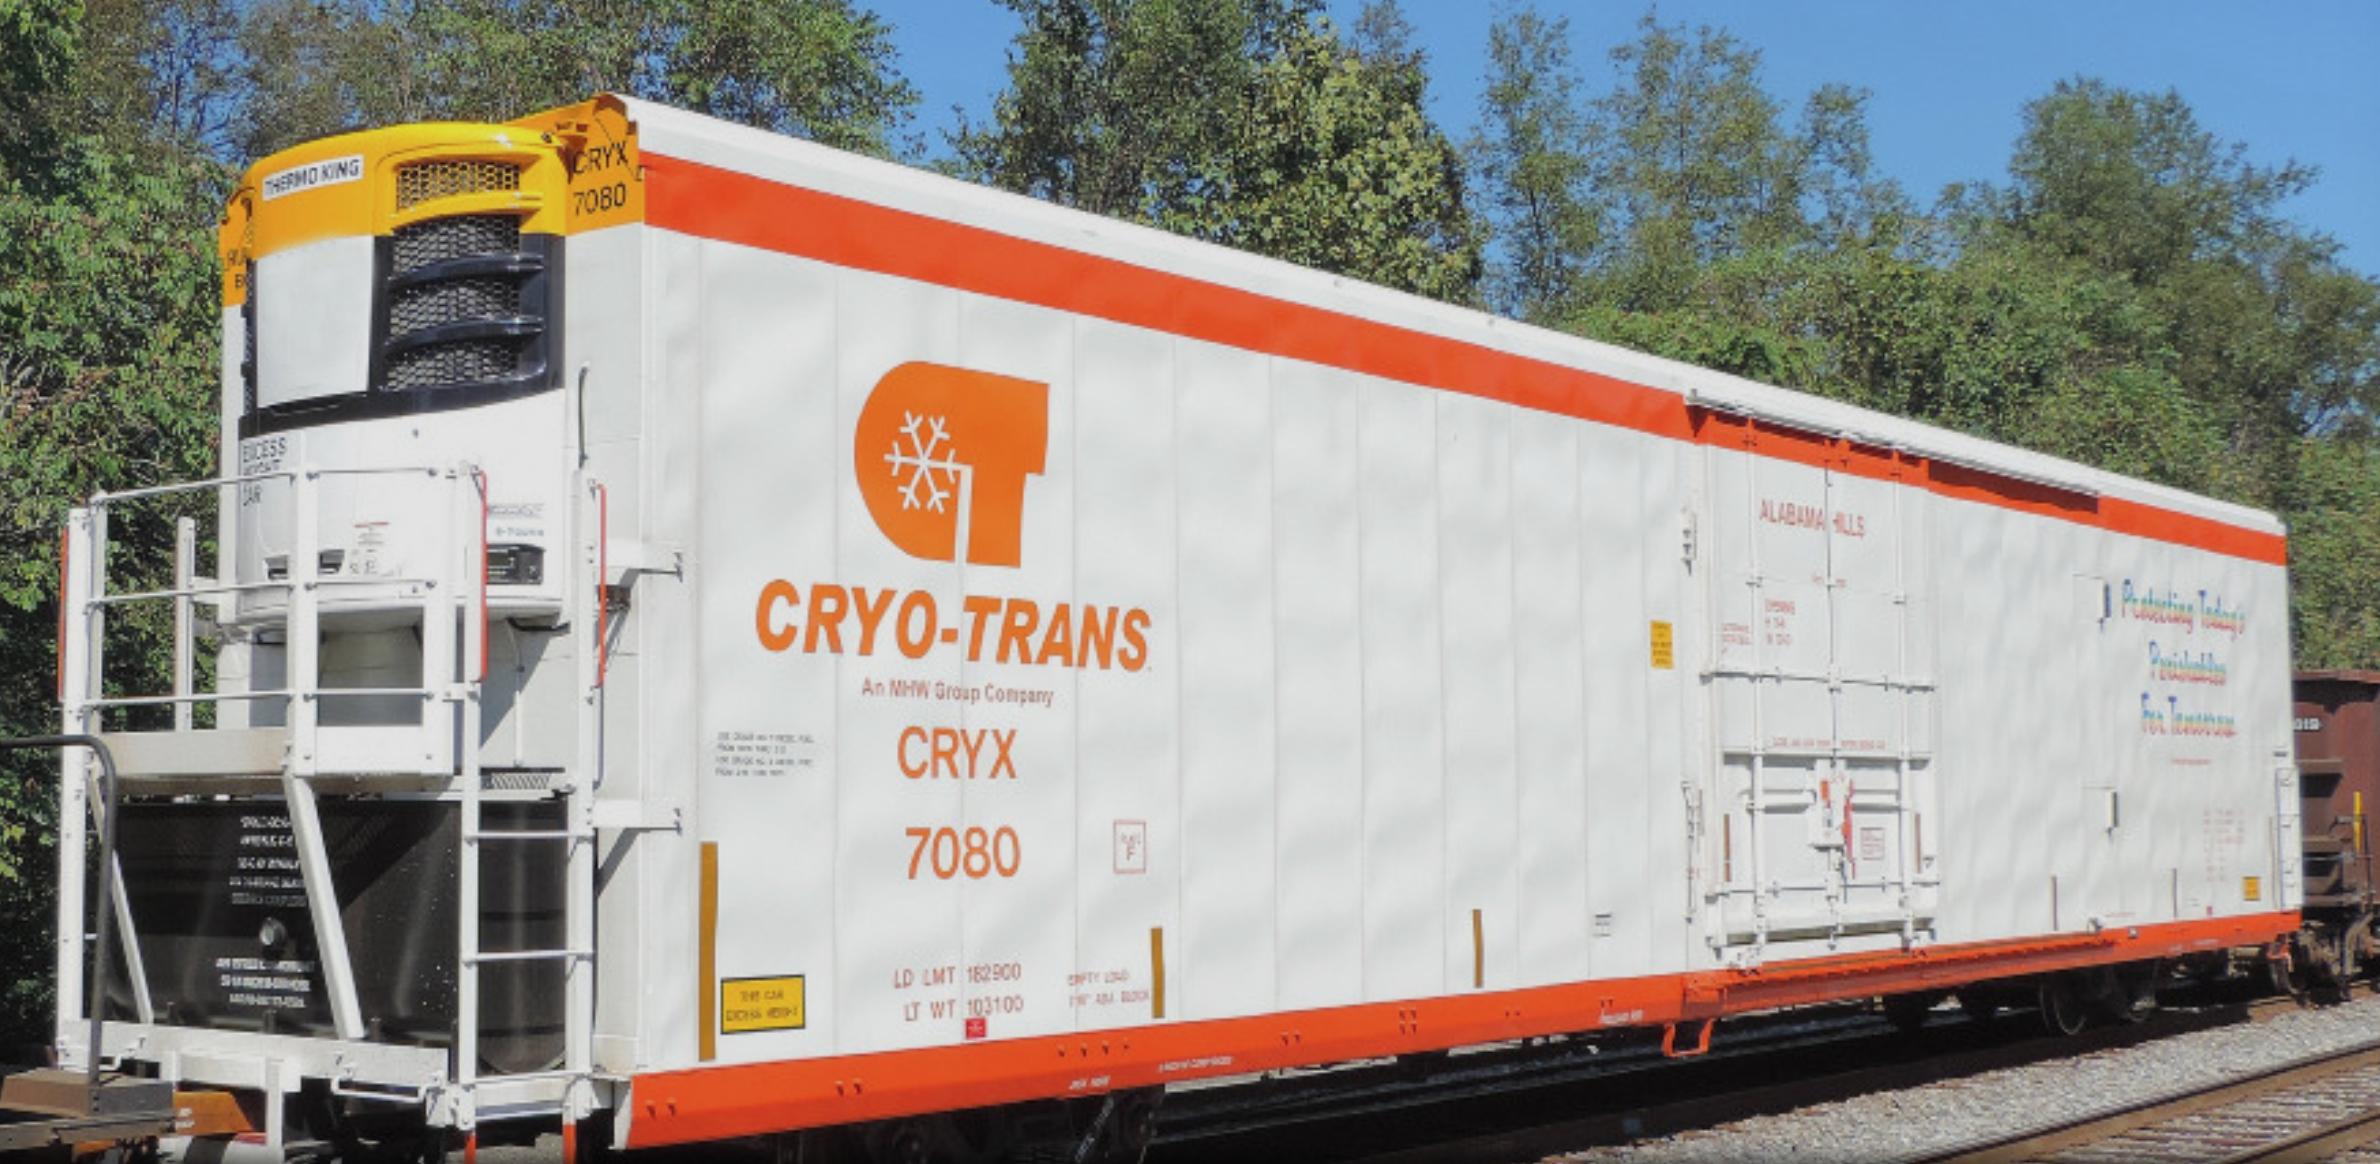 cryotrans train car